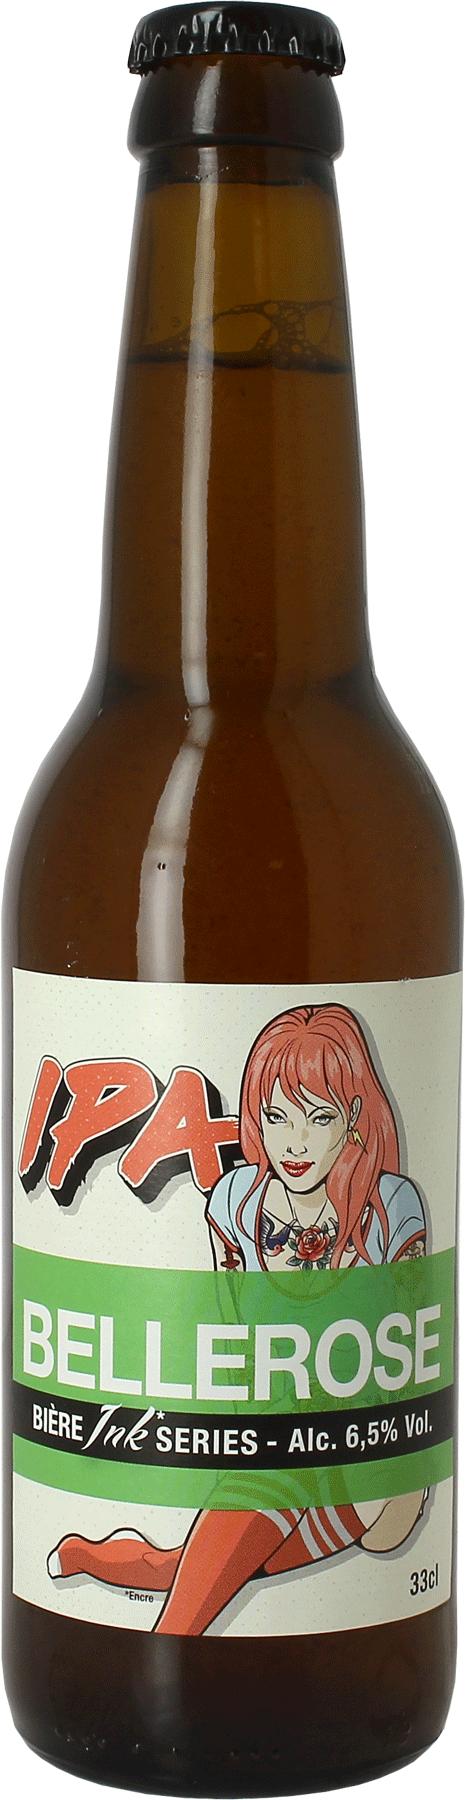 Bellerose IPA